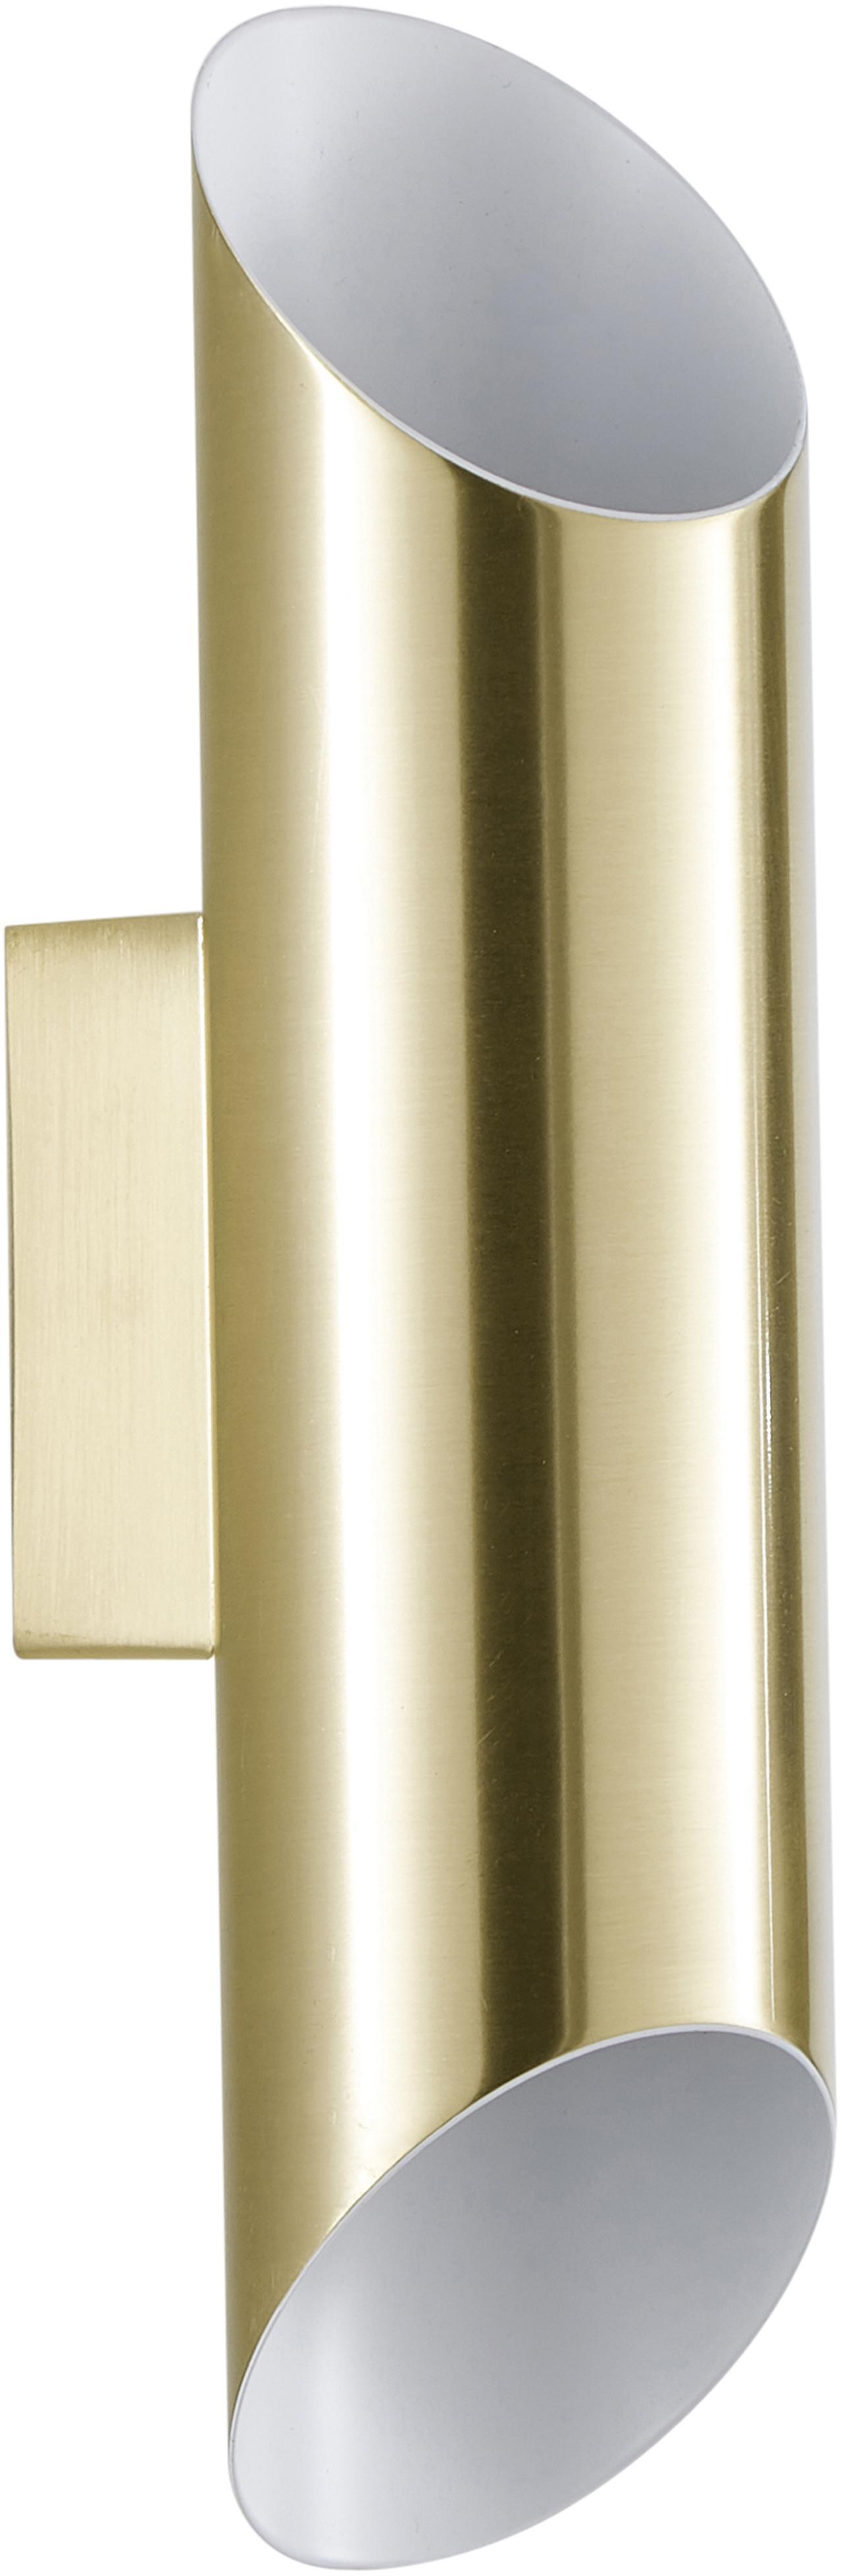 Wandleuchte Renee in Gold, Baldachin: Metall, gebürstet, Lampenschirm: Metall, gebürstet, Goldfarben,matt, 7 x 28 cm